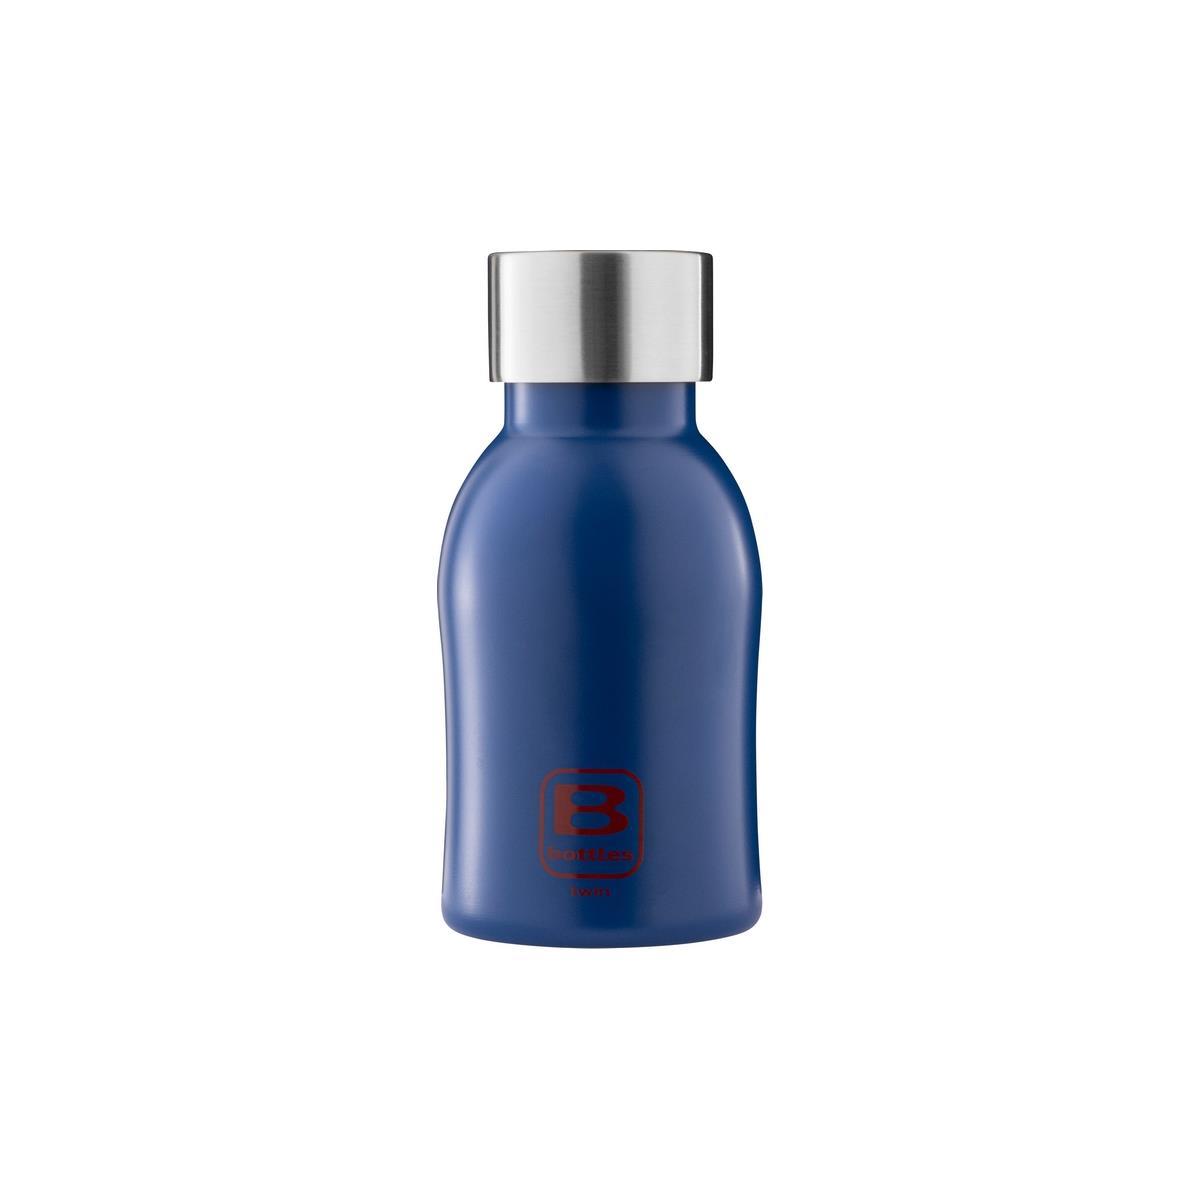 B Bottles Twin - Classic Blue - 250 ml - Bottiglia Termica a doppia parete in acciaio inox 18/10